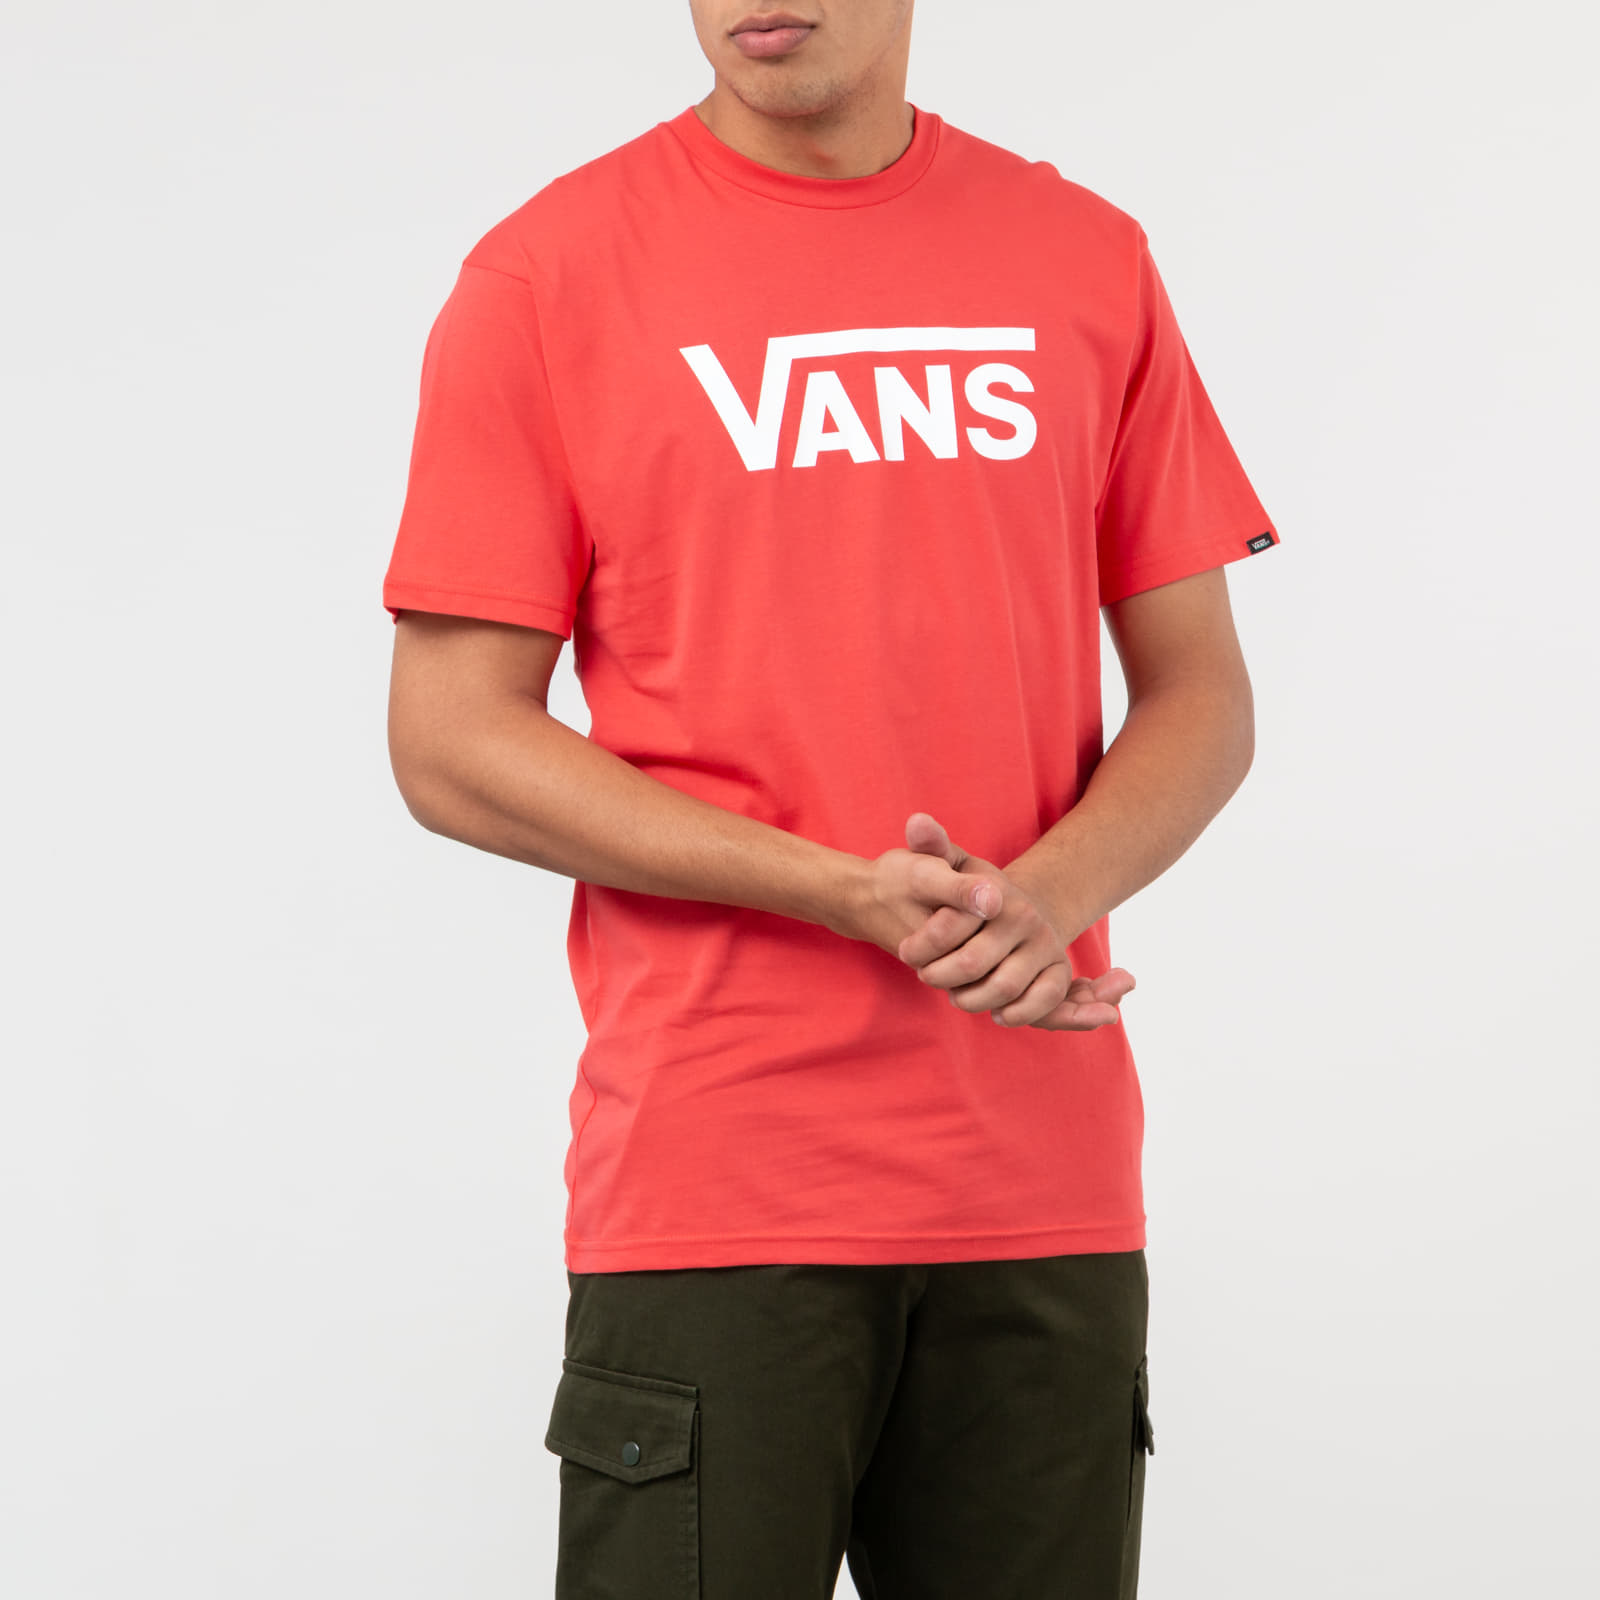 vans classic fit